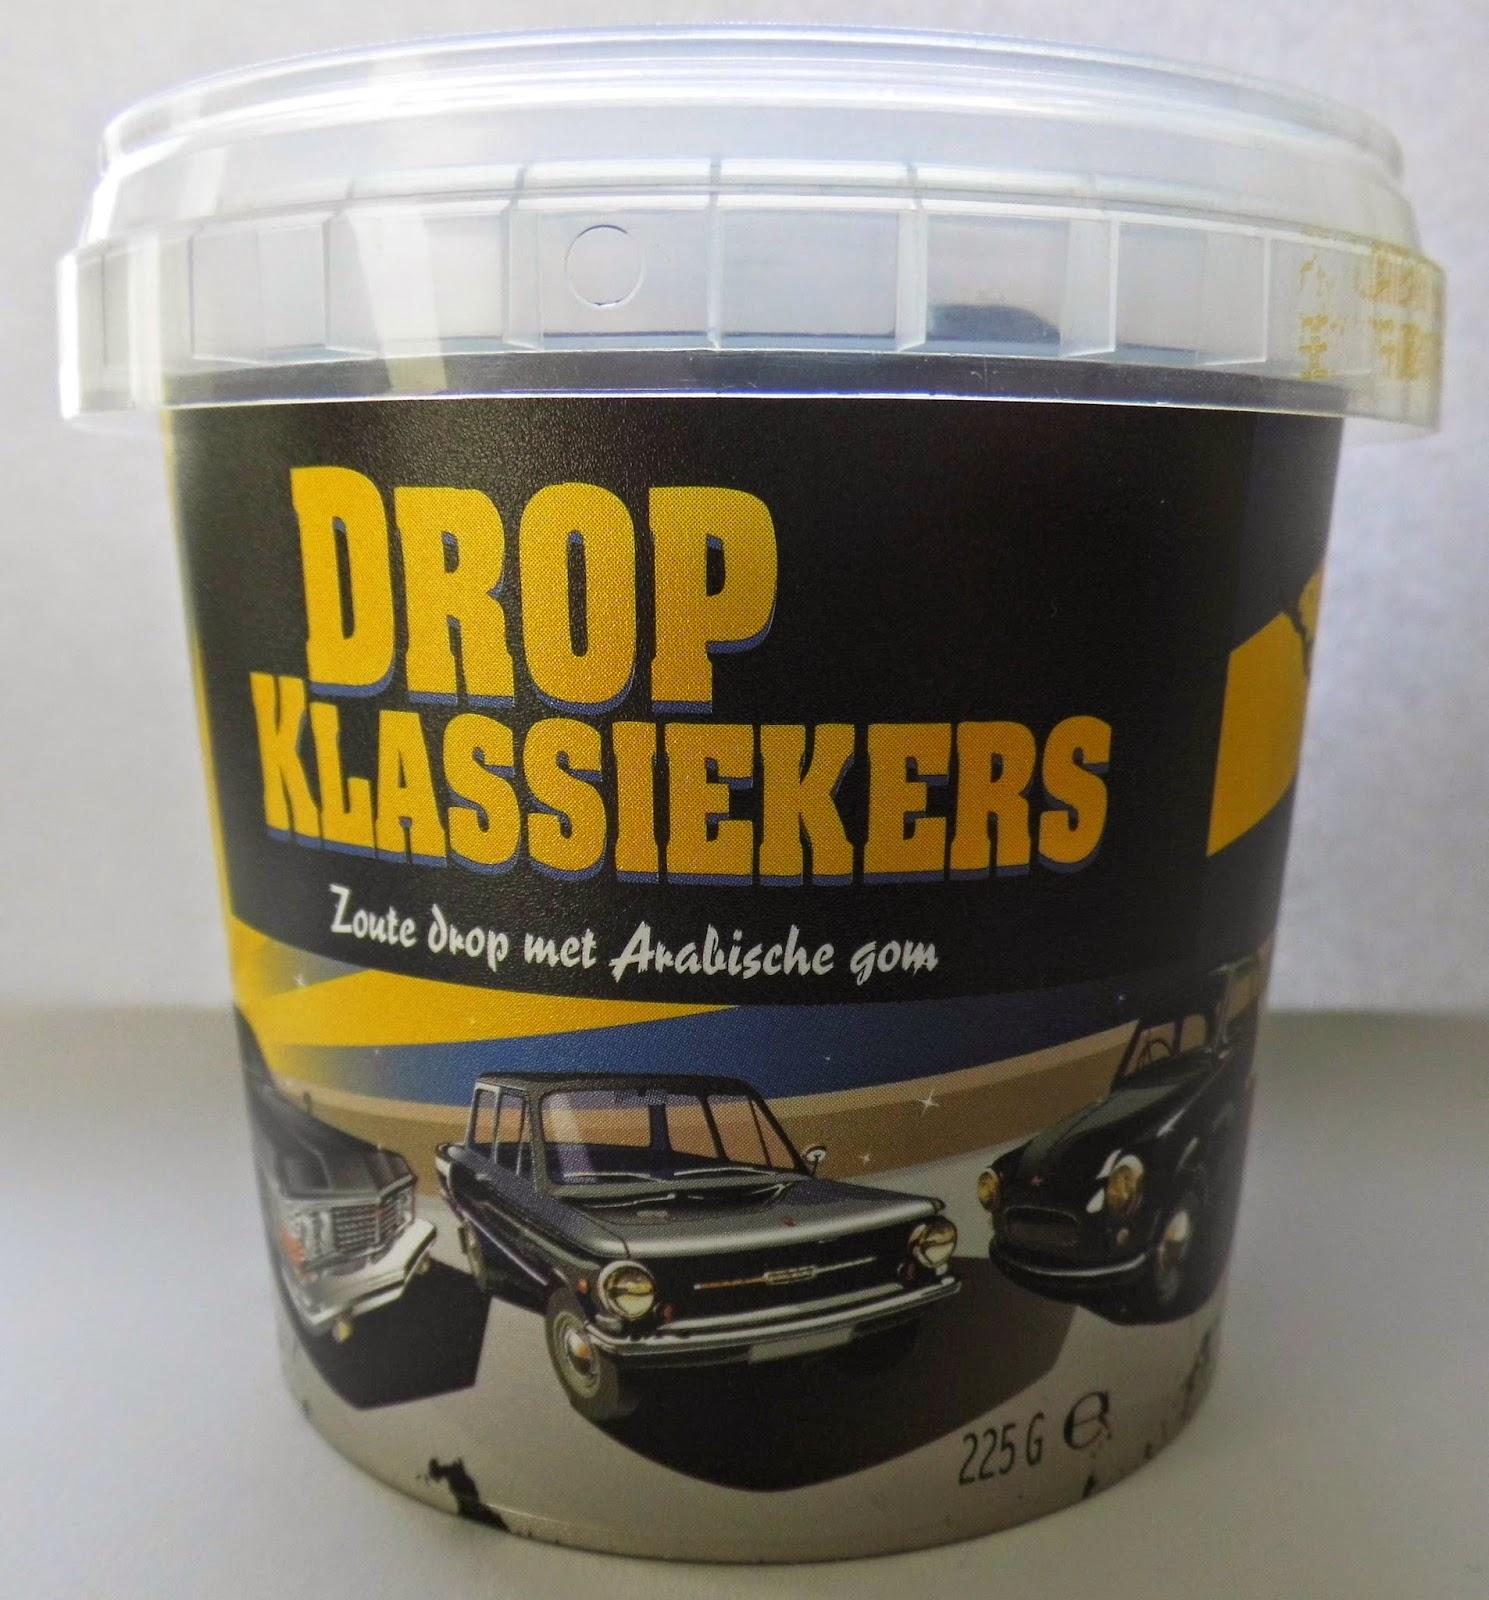 Dropklassiekers - zout